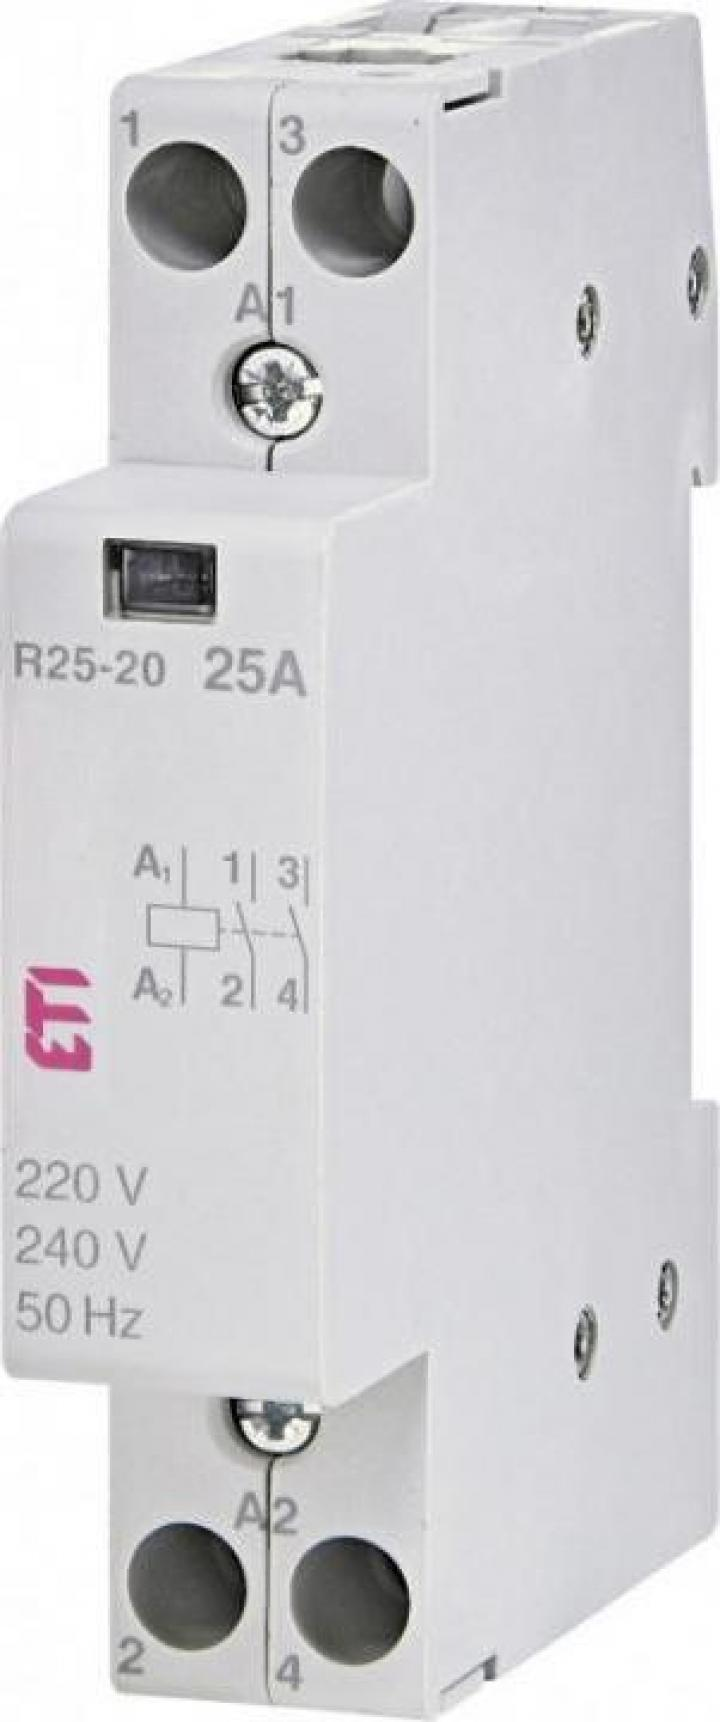 Contactor modular R 25-20 230V, ETI